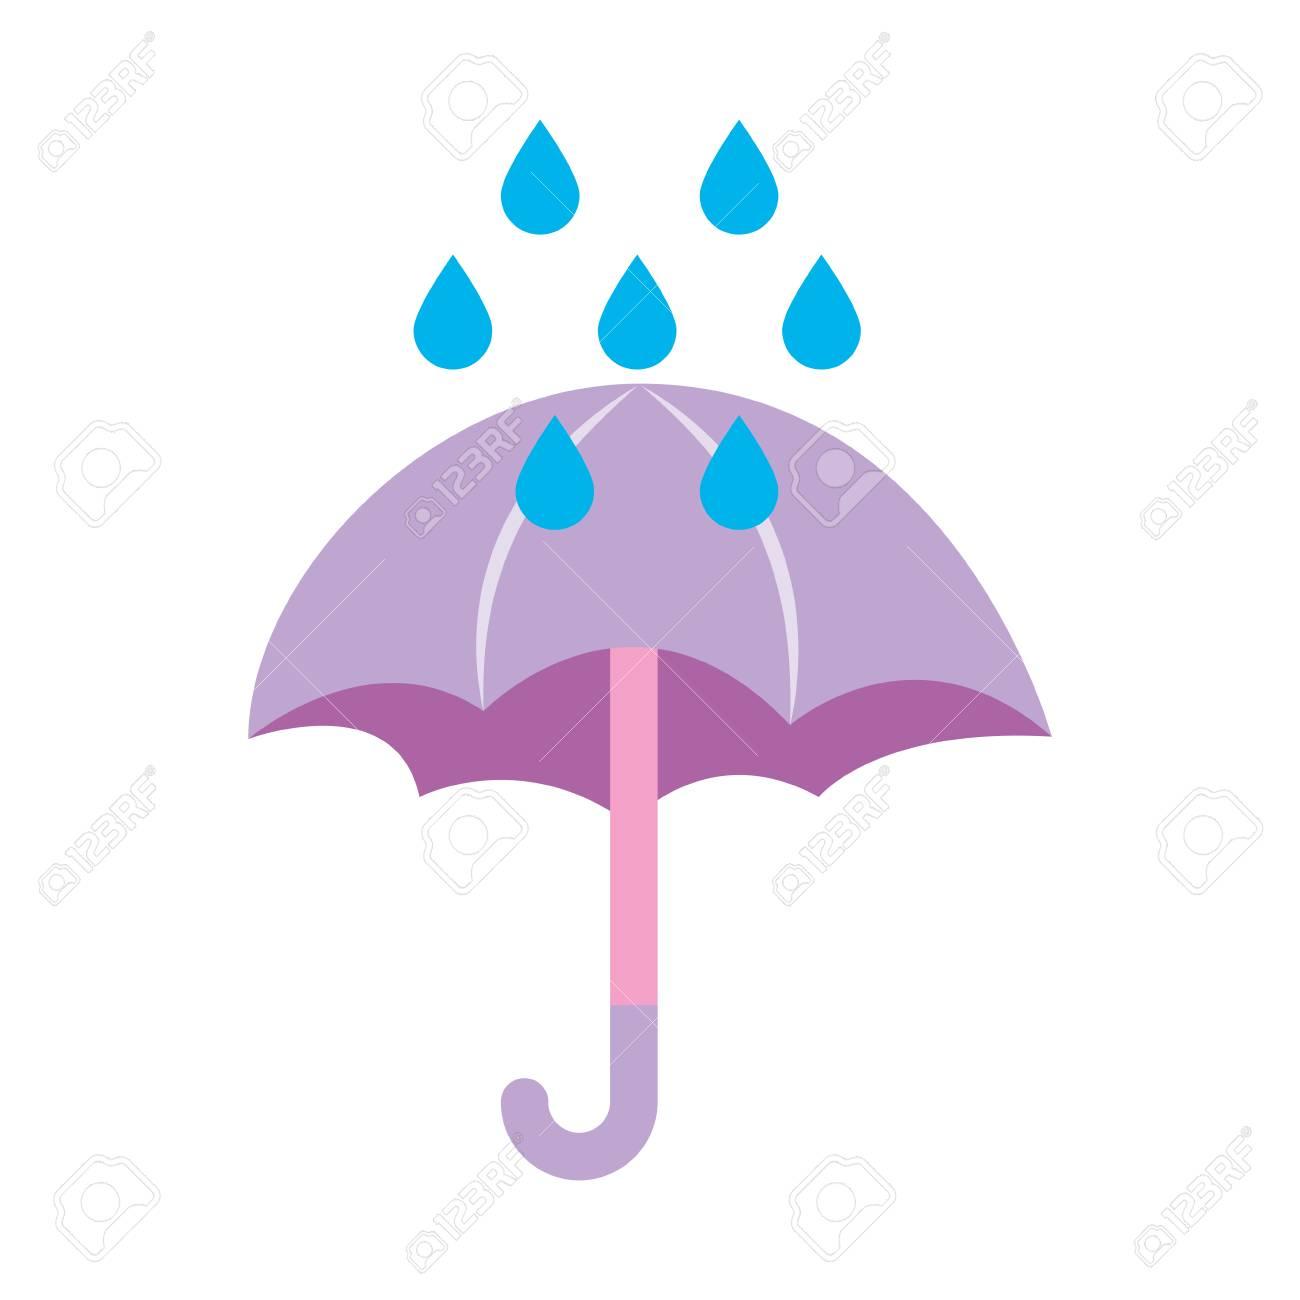 cute umbrella with rain drops vector illustration design royalty